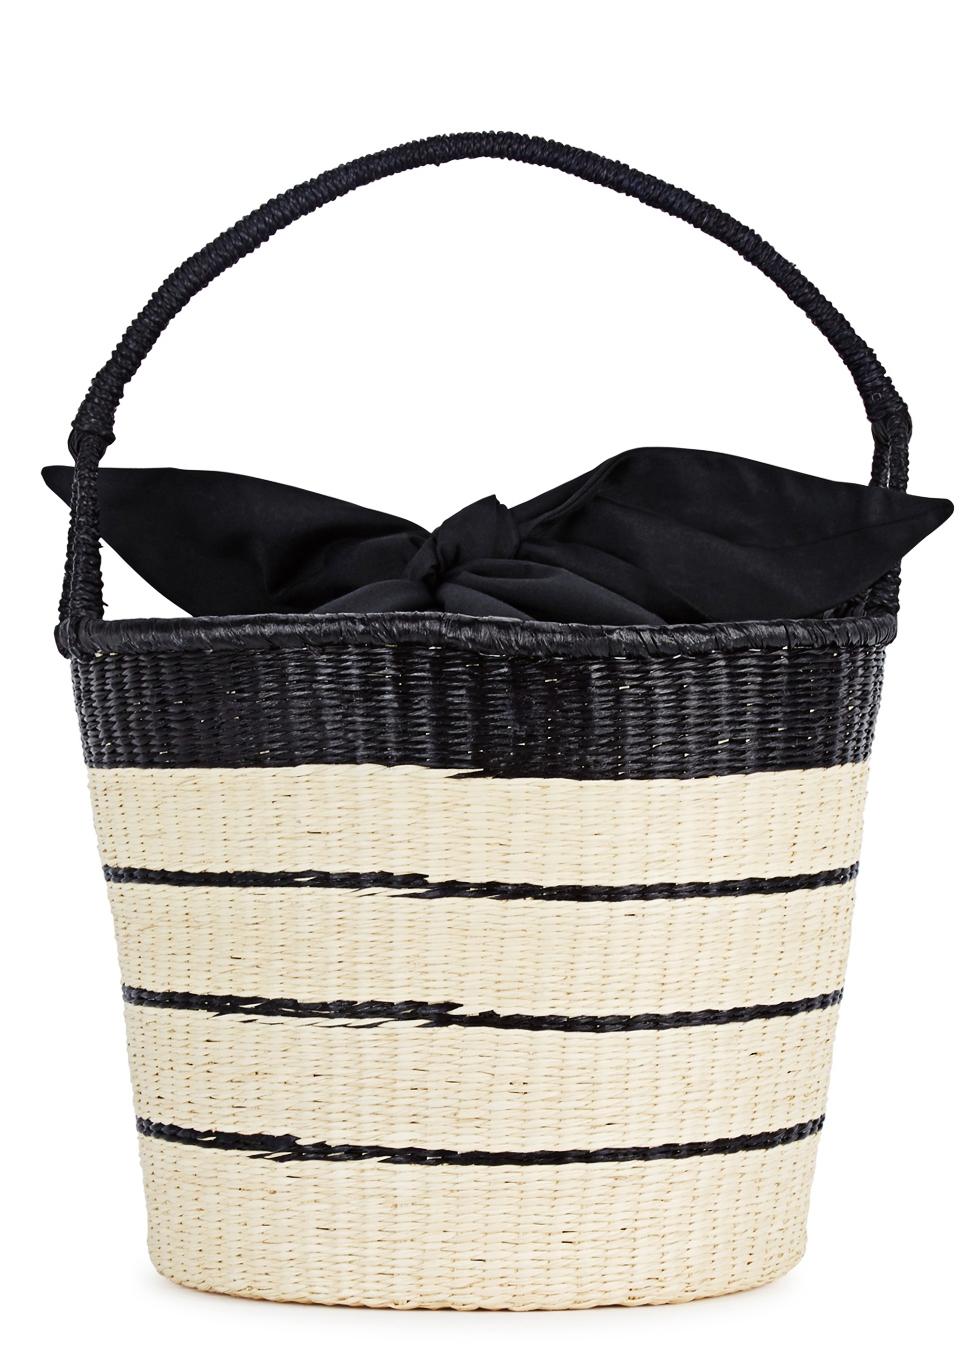 SENSI STUDIO STRIPED STRAW BASKET BAG